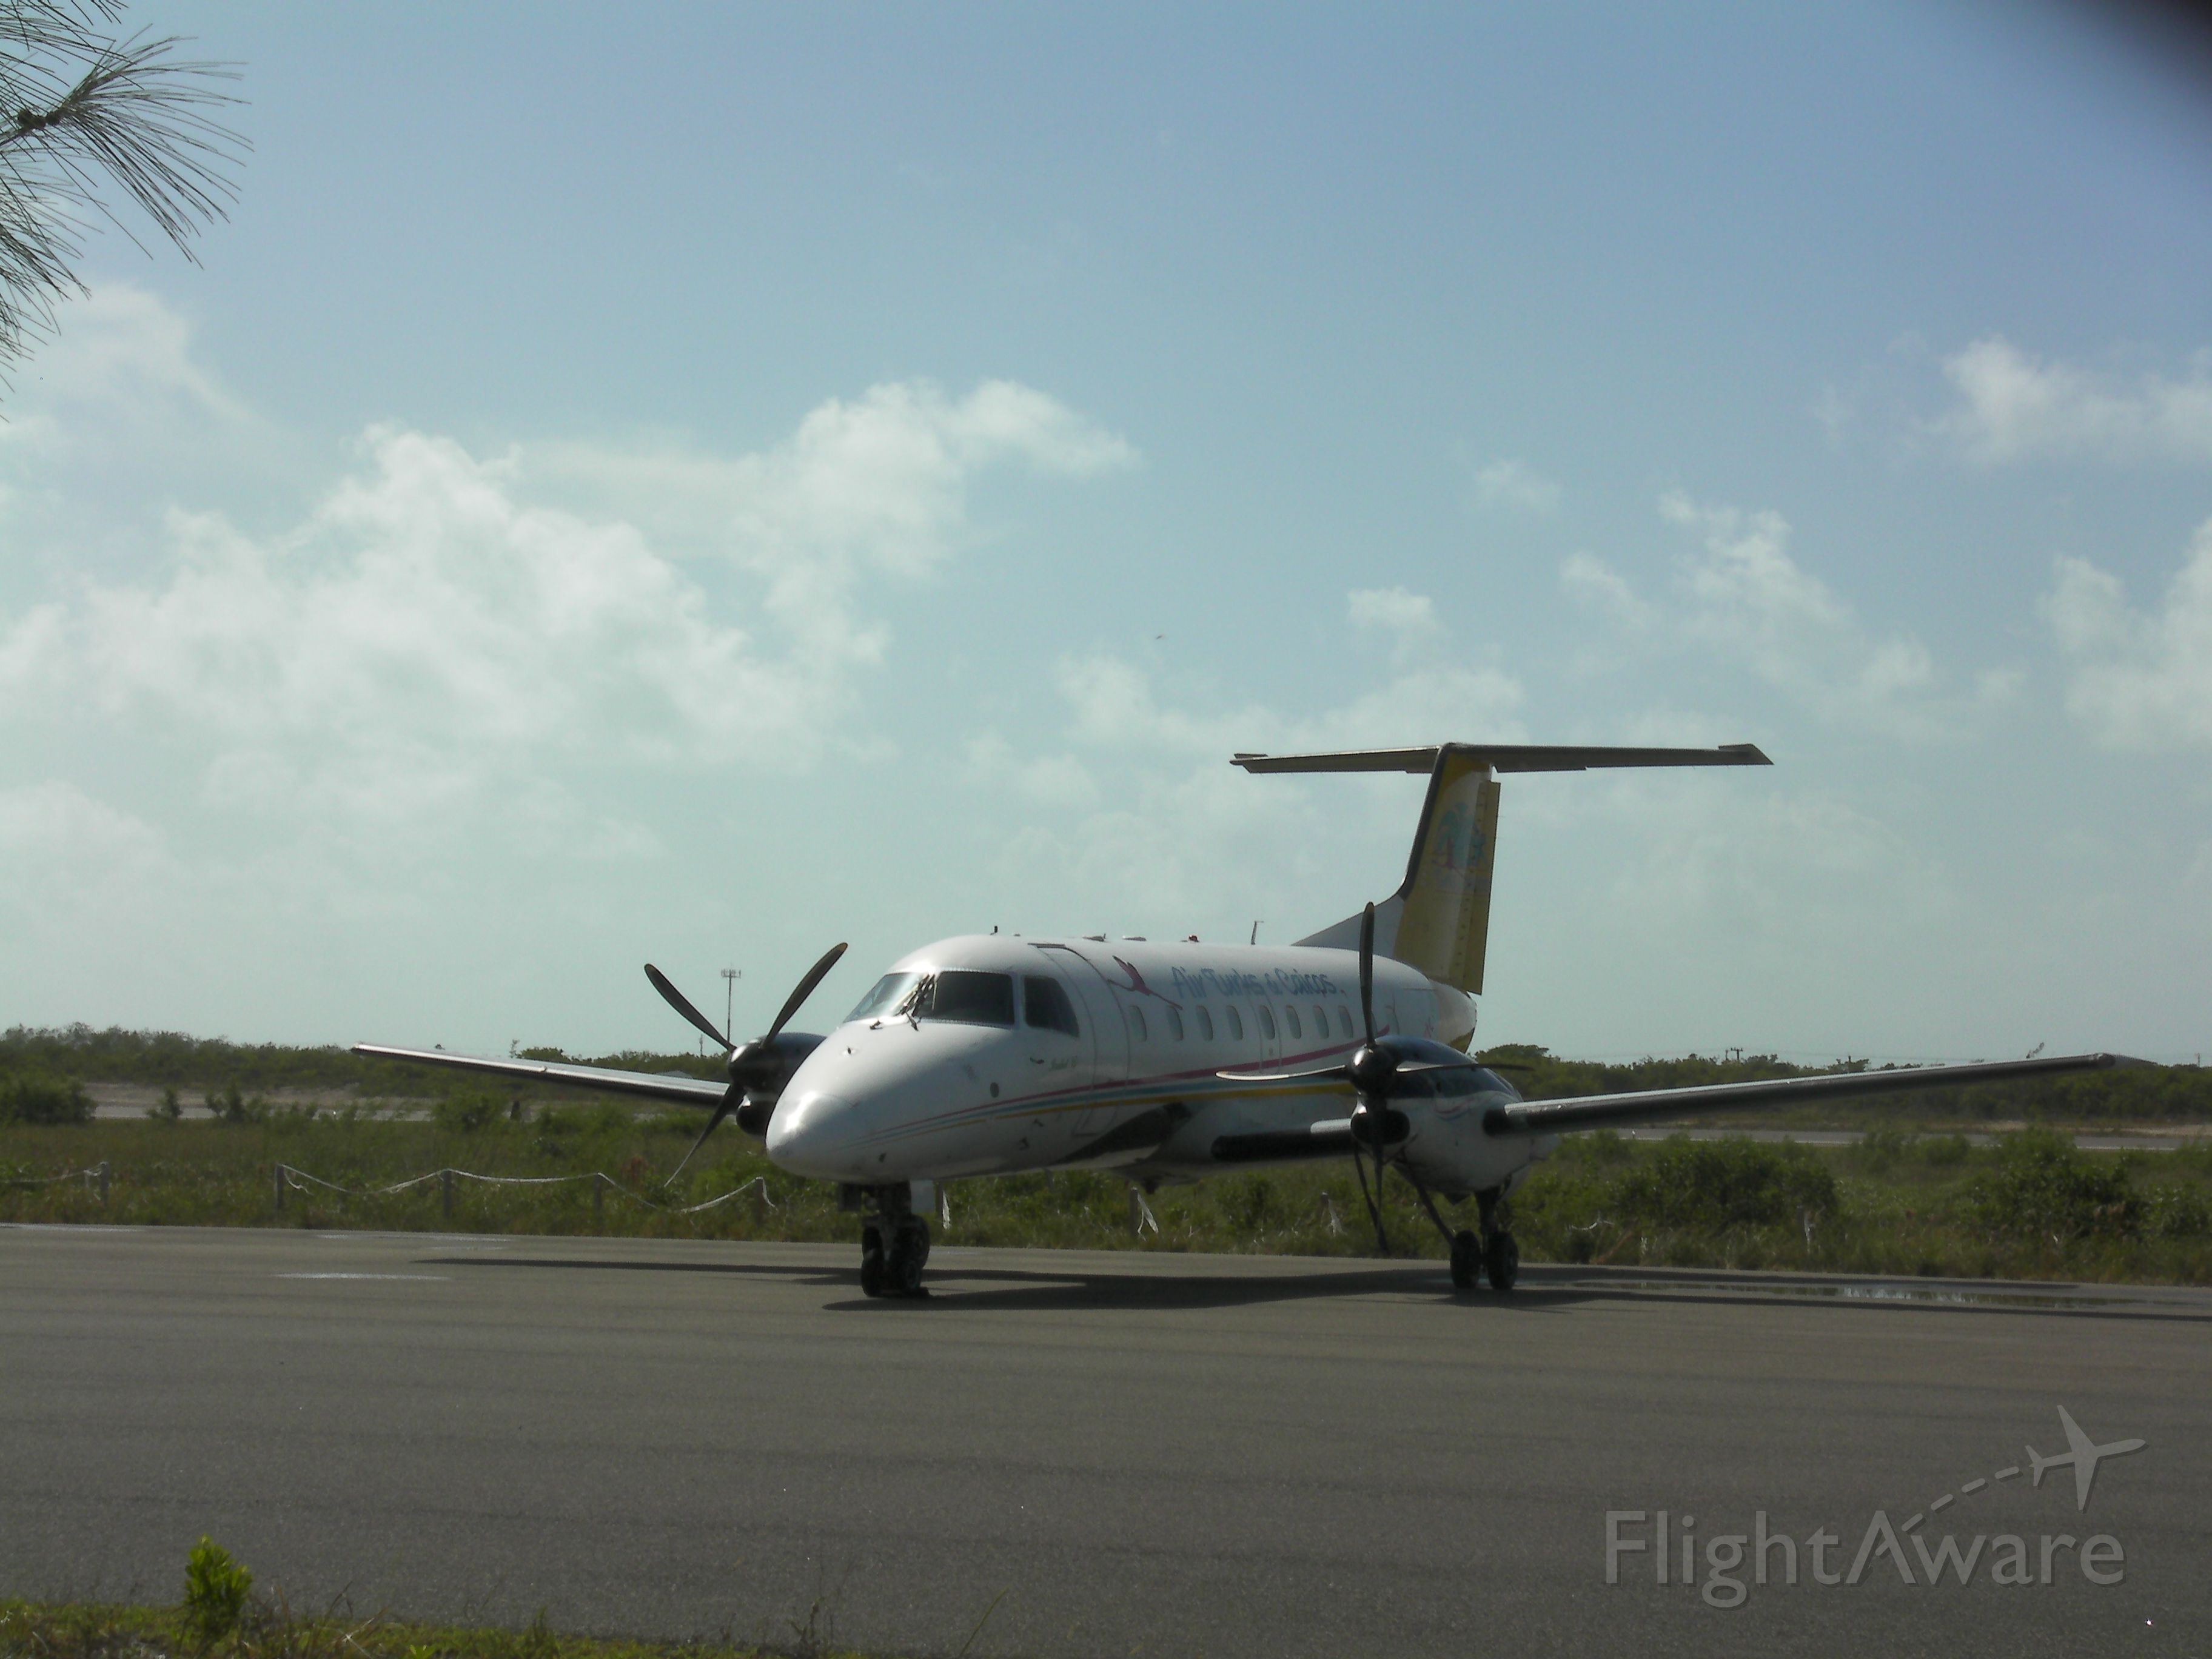 Embraer EMB-120 Brasilia (VQ-TBC) - wonderful plane